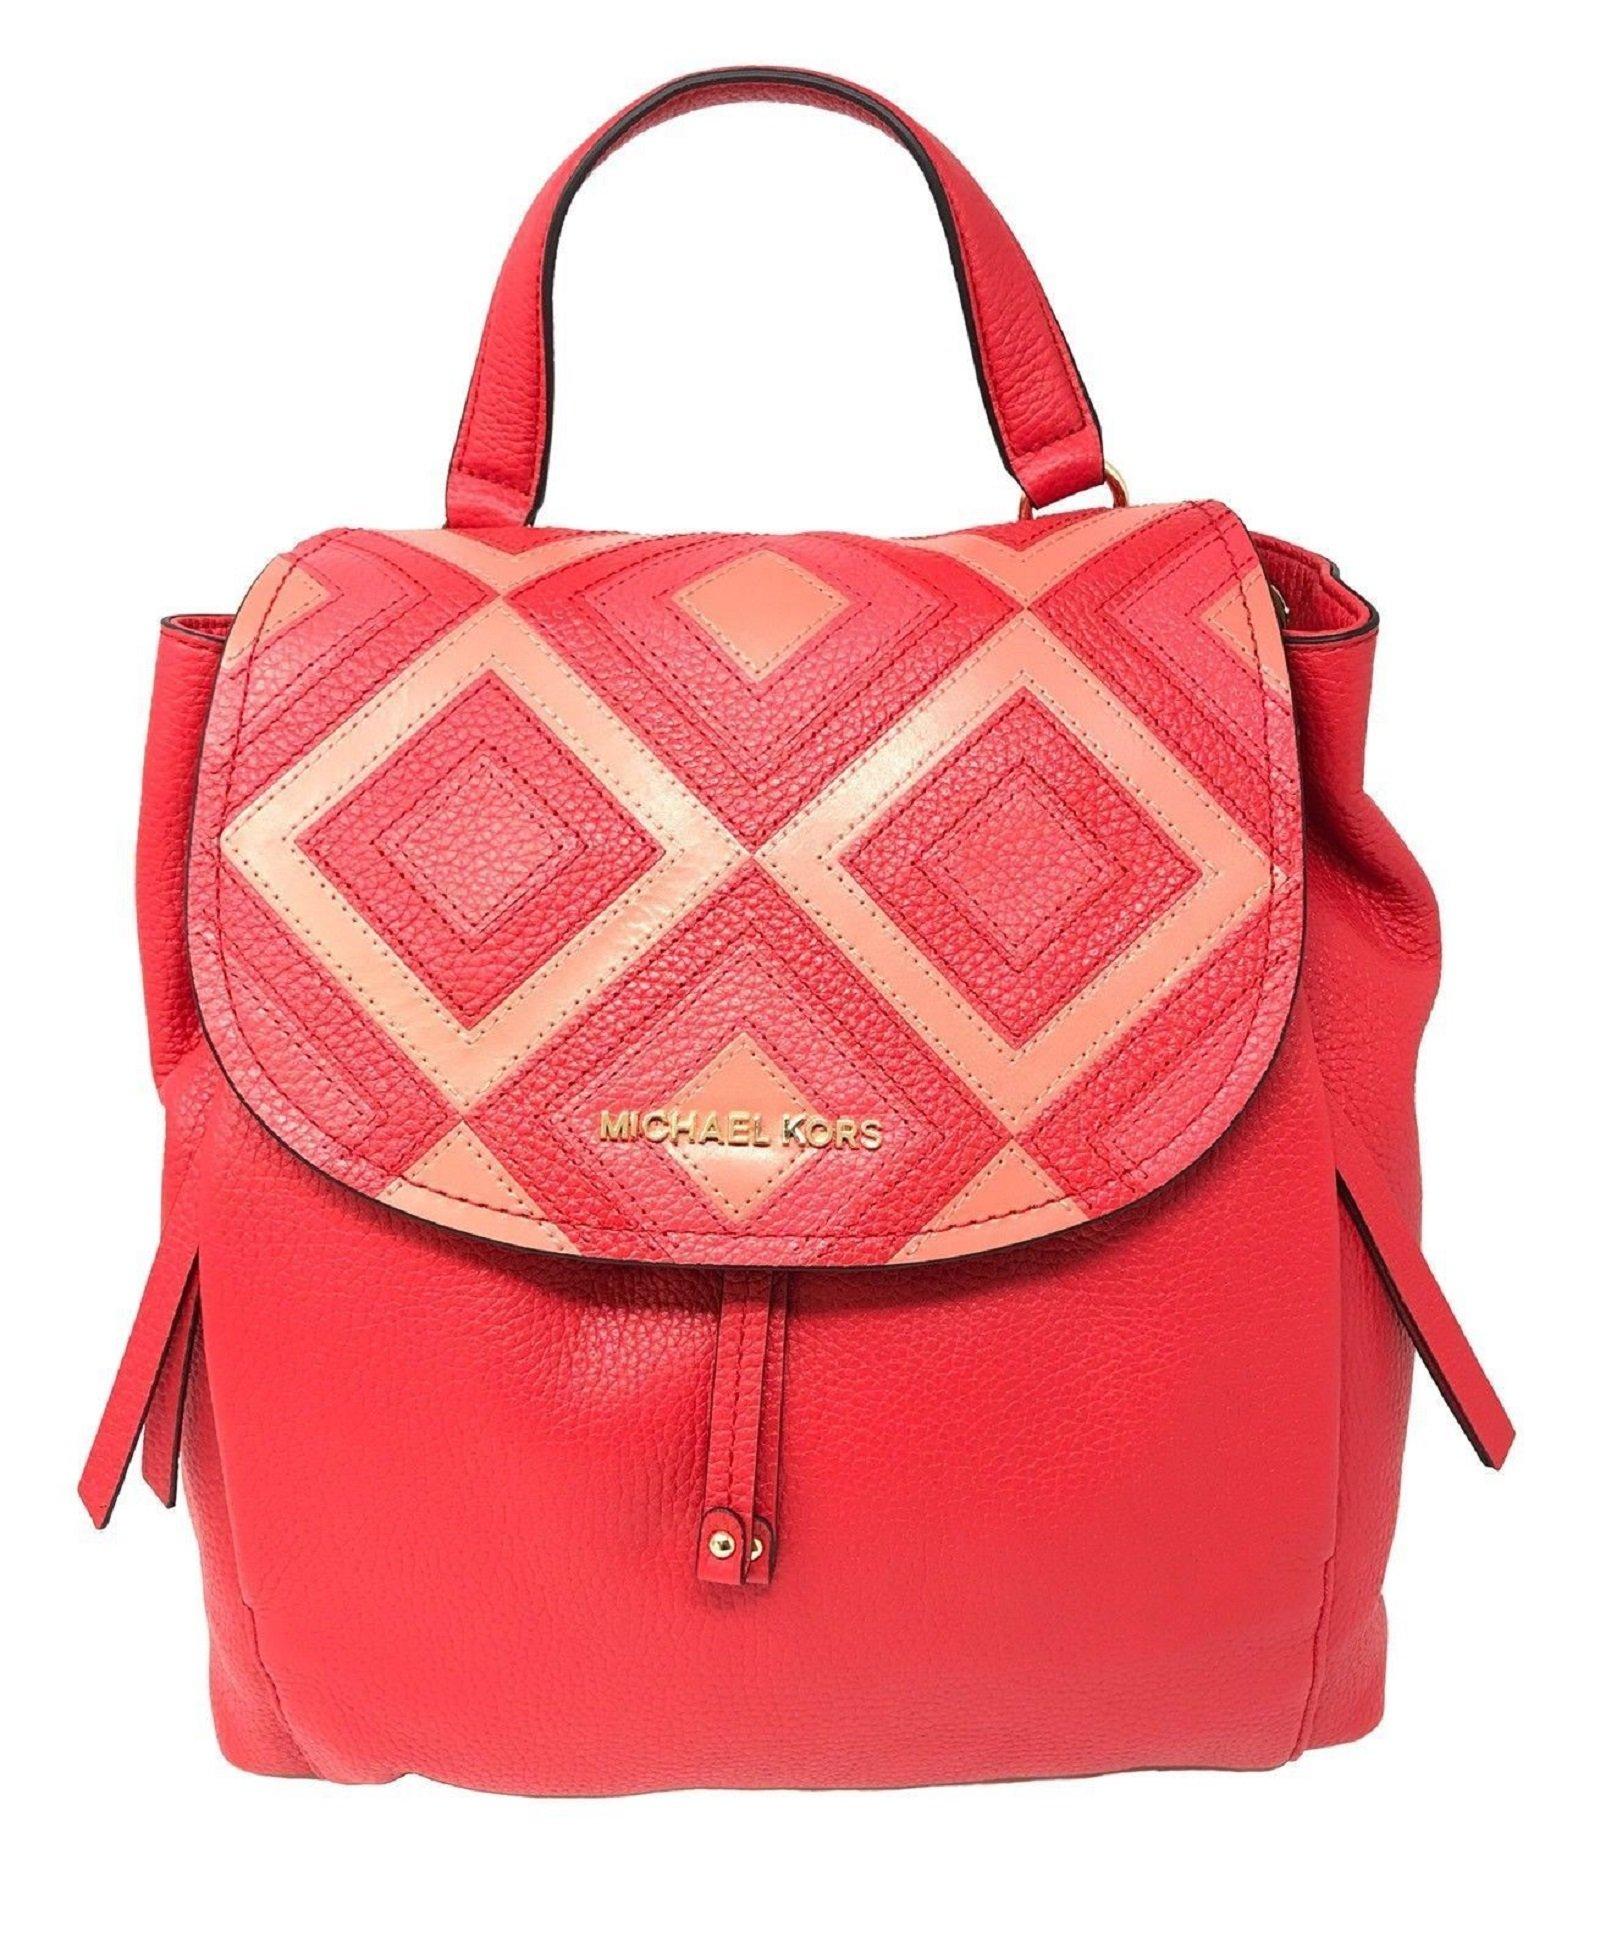 Michael Kors Riley LG Leather Backpack Drawstring Flap Bag DK Sangria